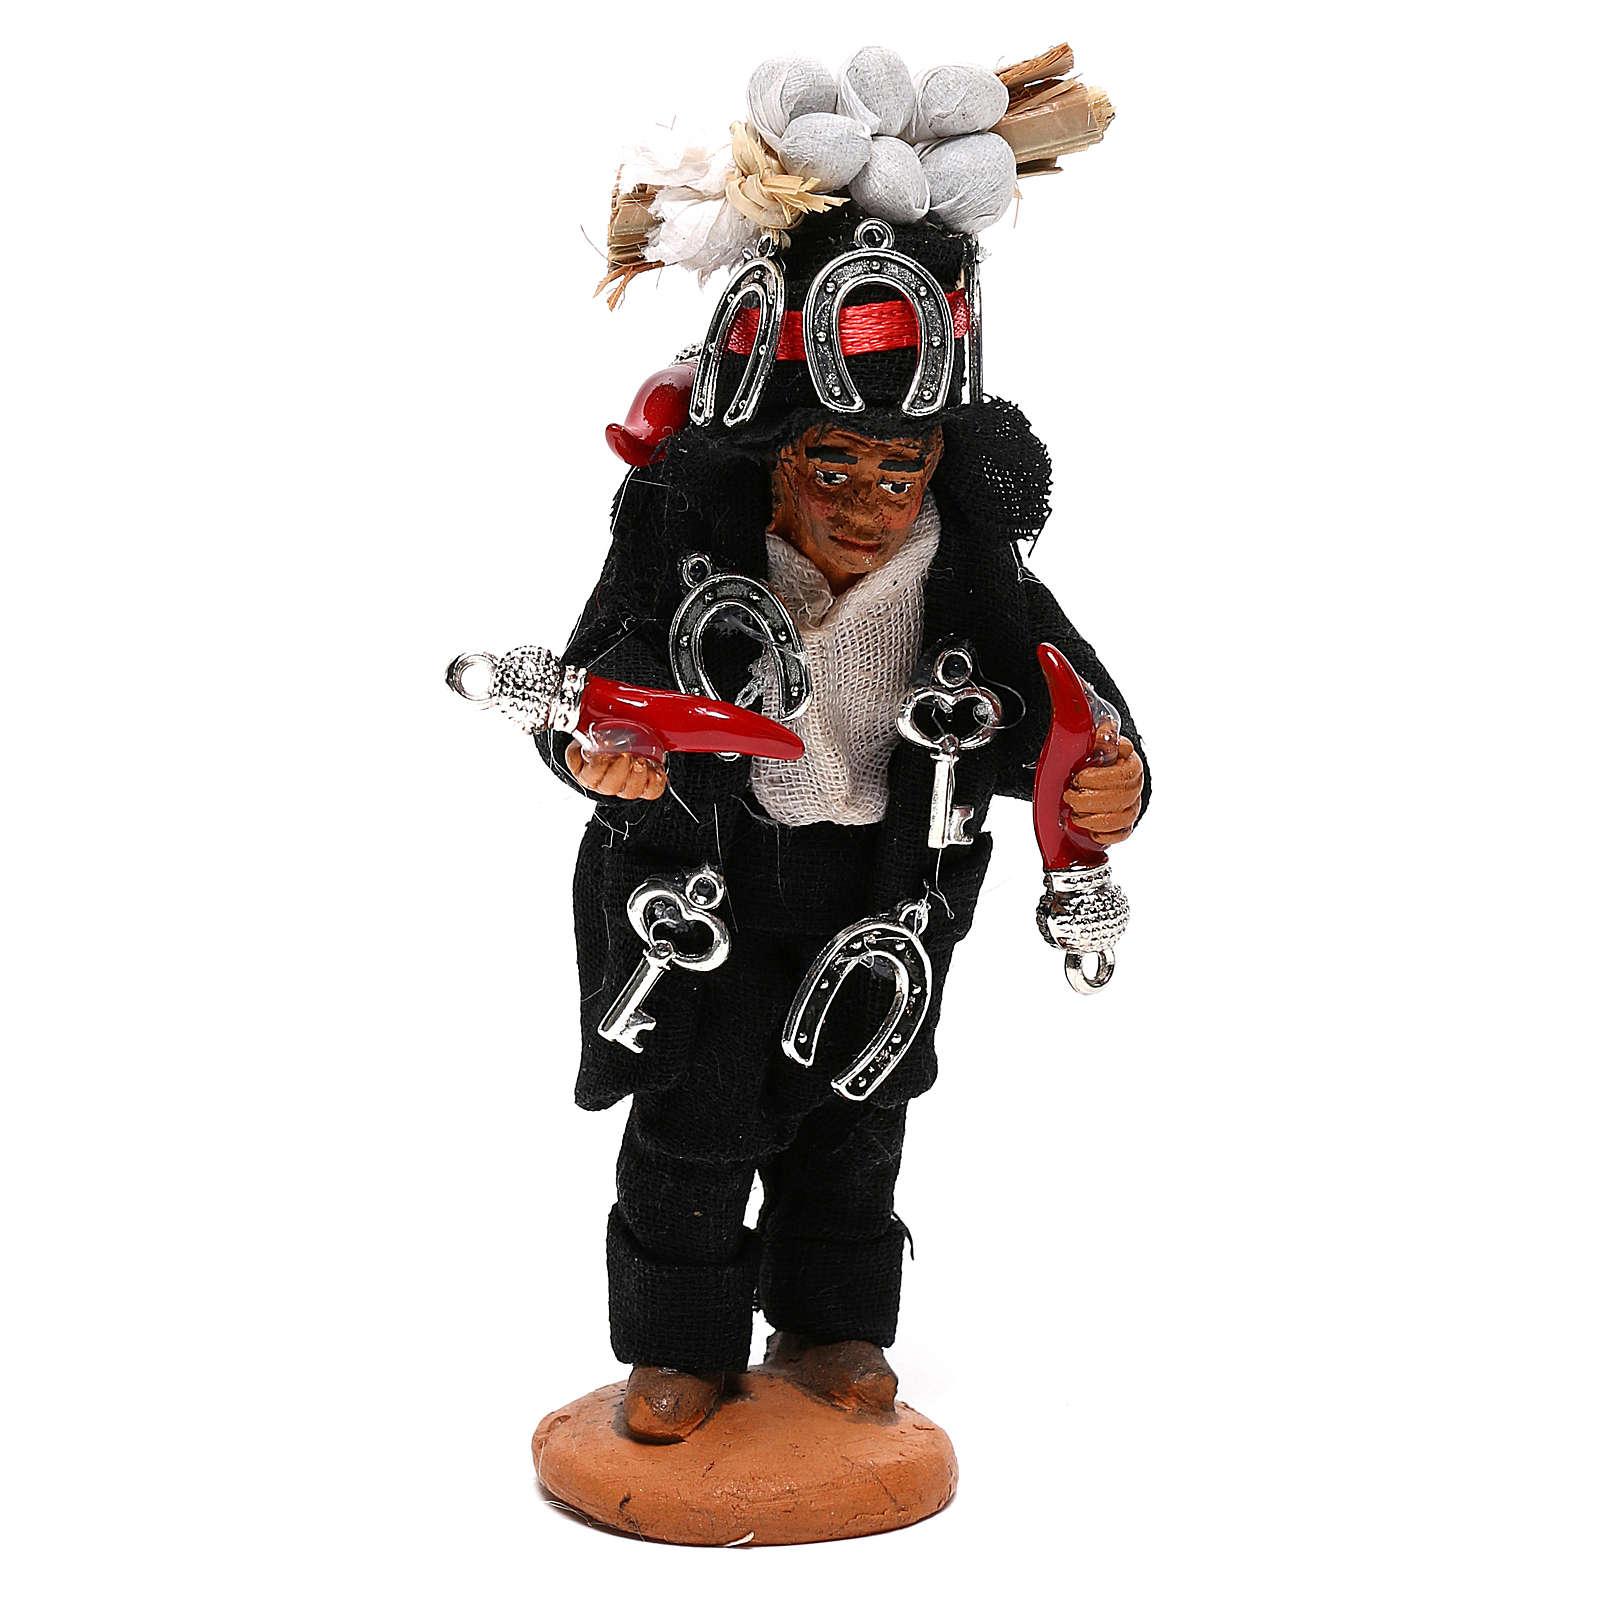 Hunchbacked man with good luck charms, Neapolitan nativity figurine 10cm 4